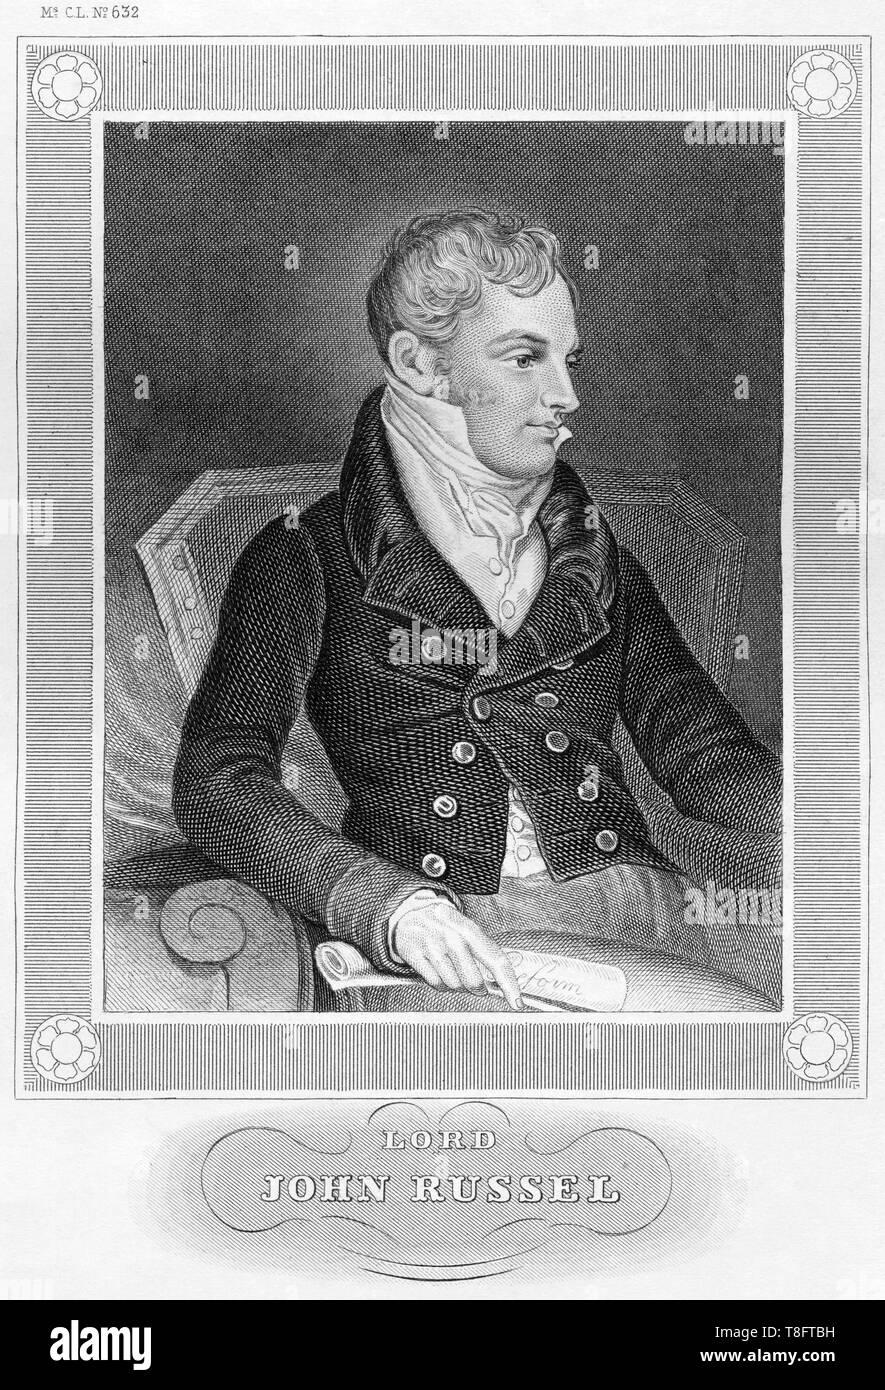 Europa, Großbritannien, London, John Russel, 1. Earl Russel, britischer Politiker, Stahlstich, um 1850er Jahre, Künstler unbekannt .  /  Europe, Great - Stock Image